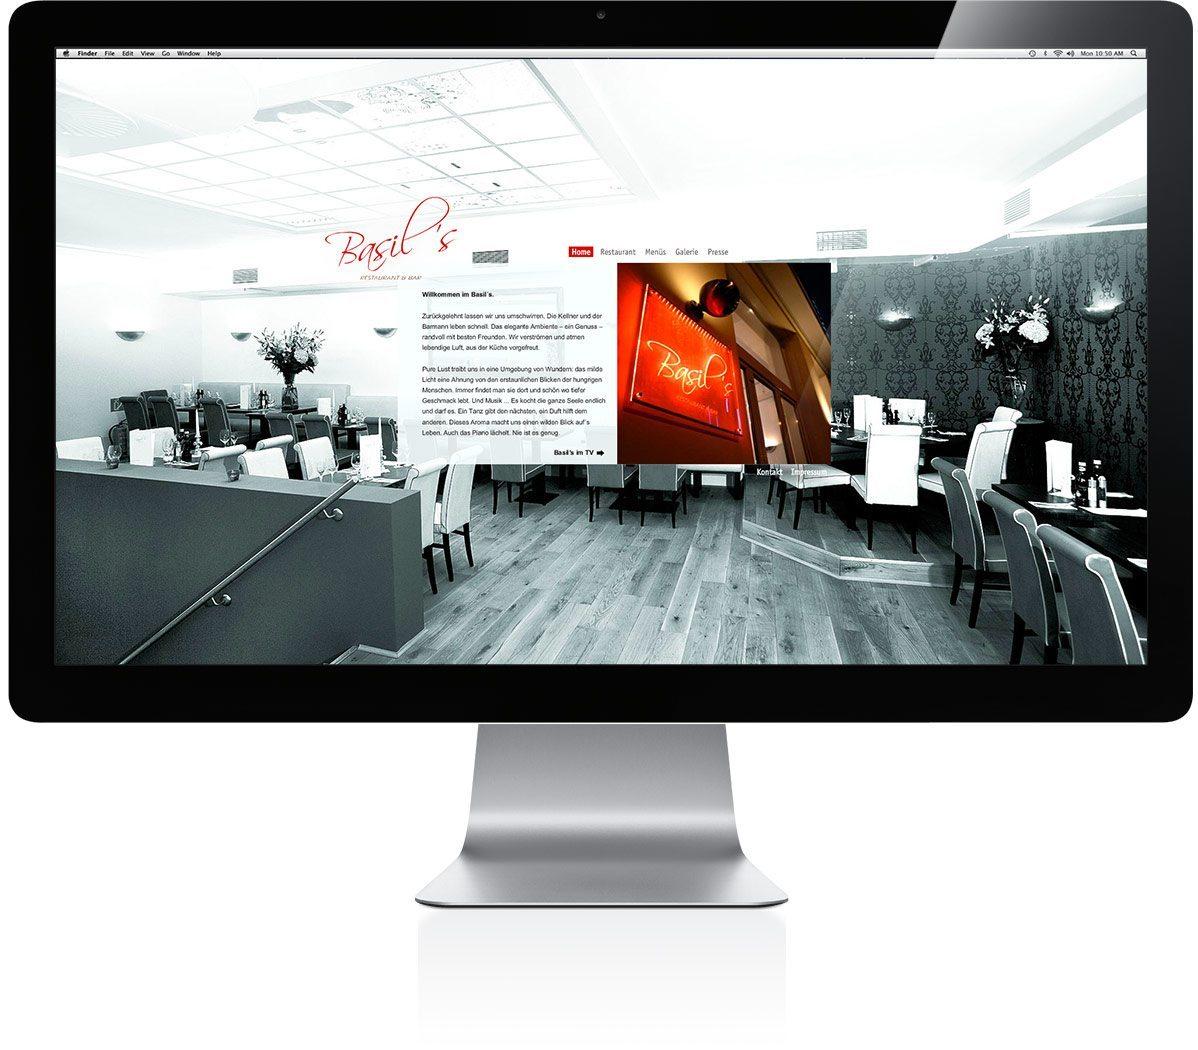 basils-iwebsite